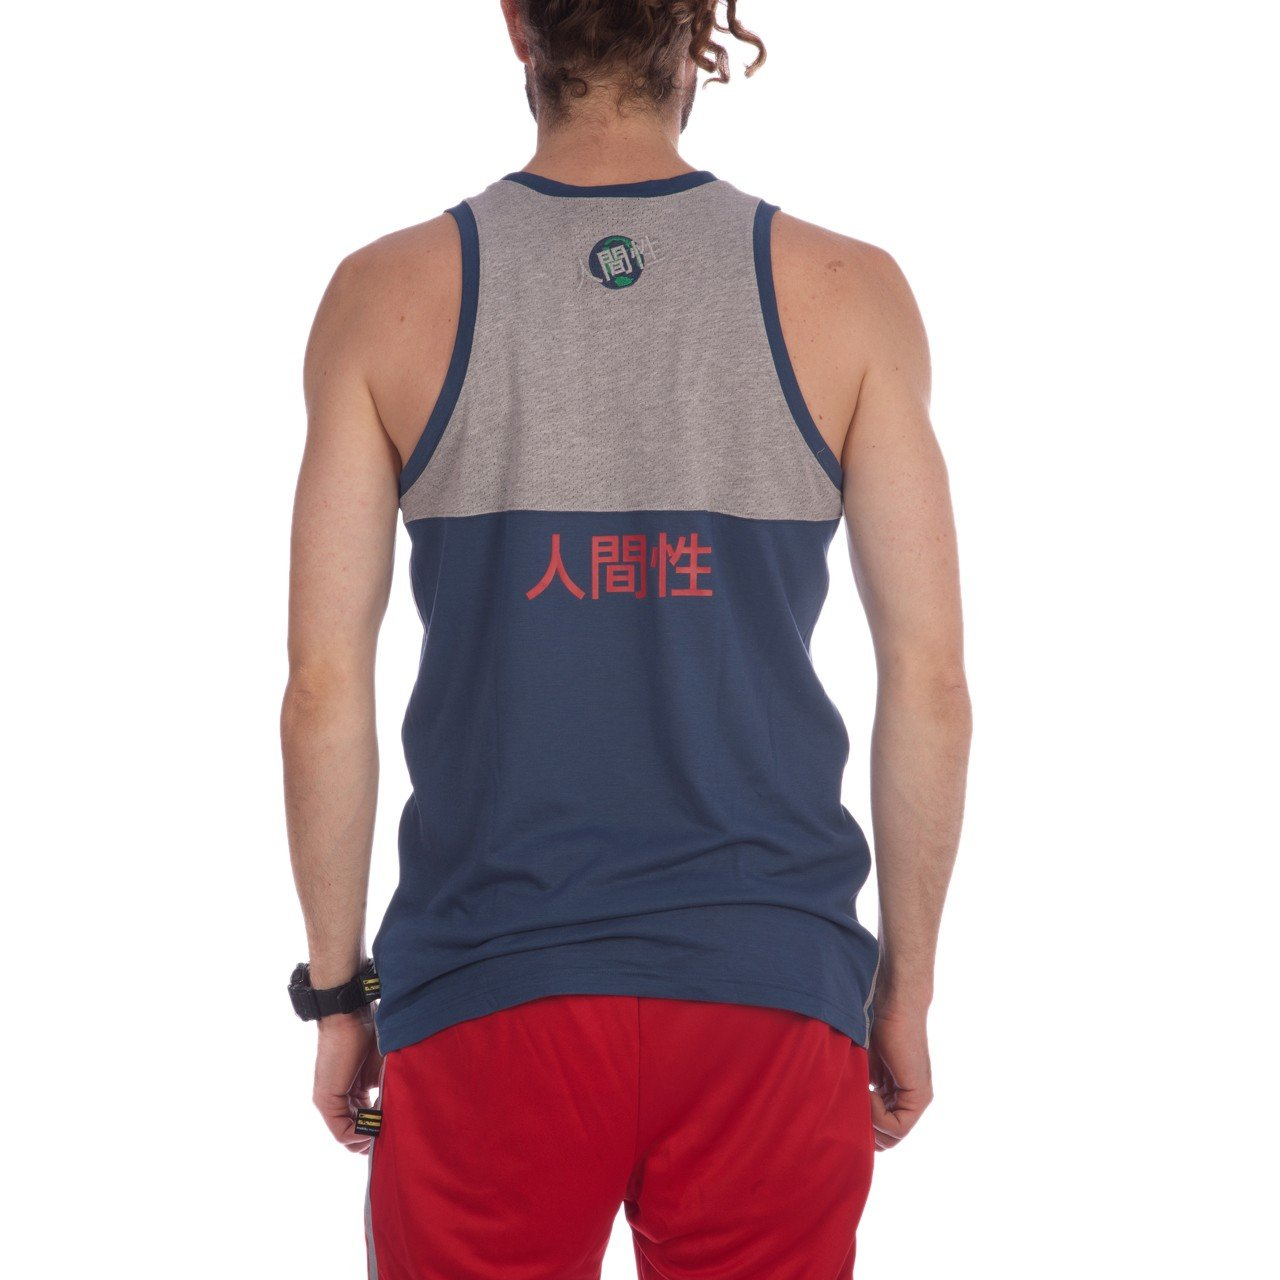 40b3ddc7aa1b1 adidas x Pharrell Williams Men Hu Race Tank Top (Blue Night Marine)  Amazon. co.uk  Clothing